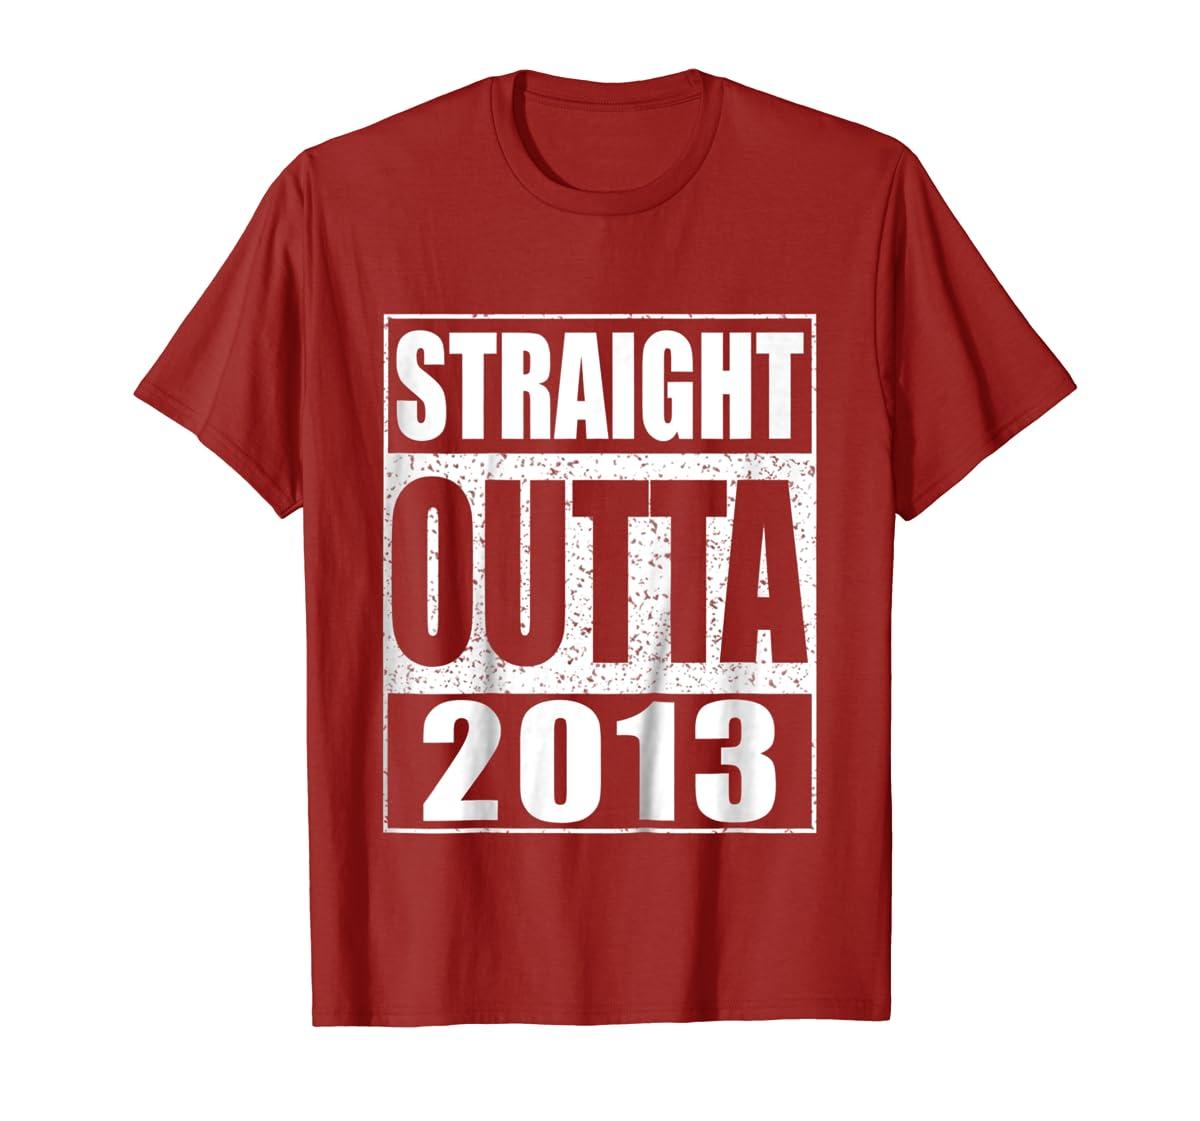 Kids Straight Outta 2013 T-Shirt 6th Birthday Gift Shirt-Men's T-Shirt-Red